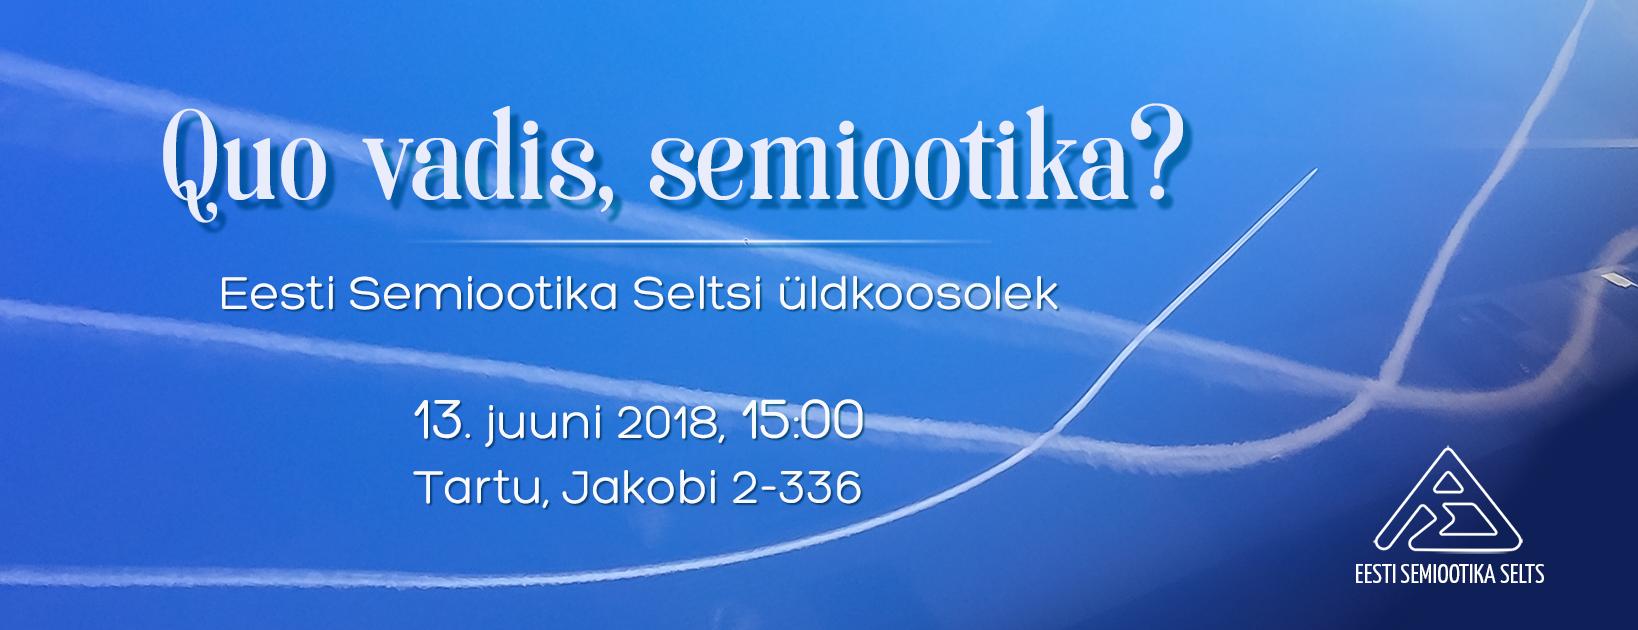 Eesti Semiootika Selts